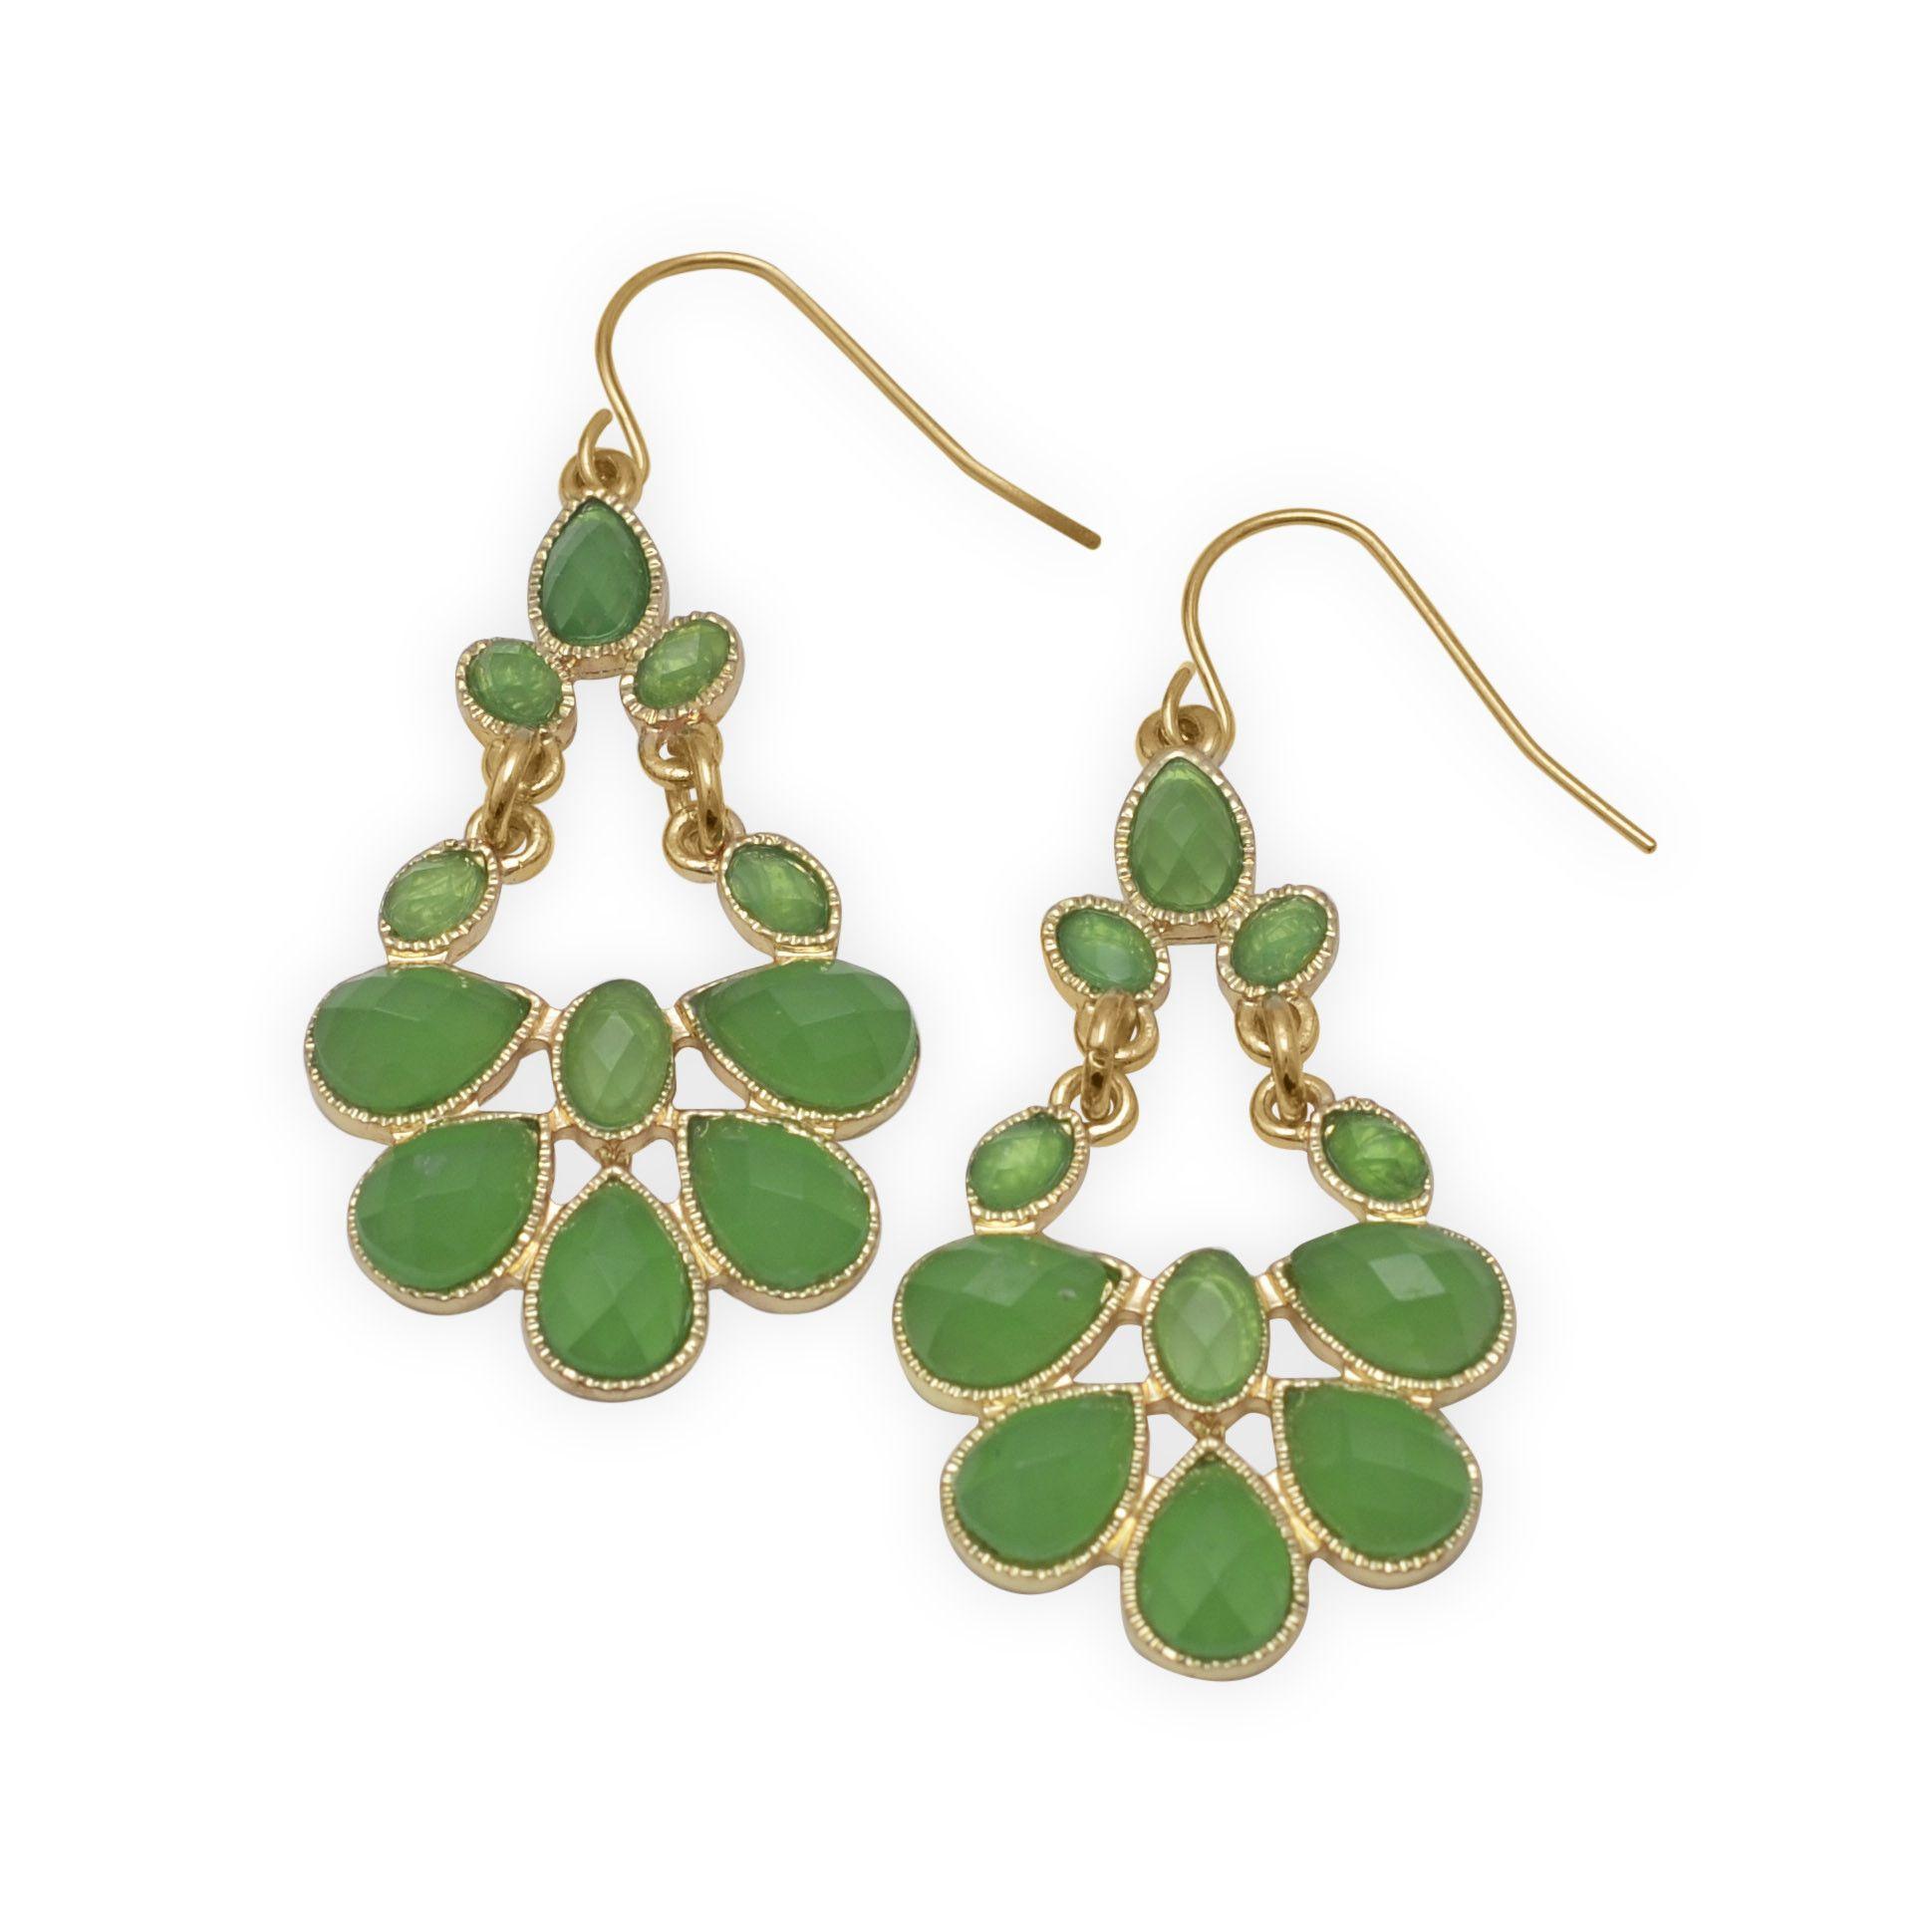 Candy Apple Green Fashion Earrings